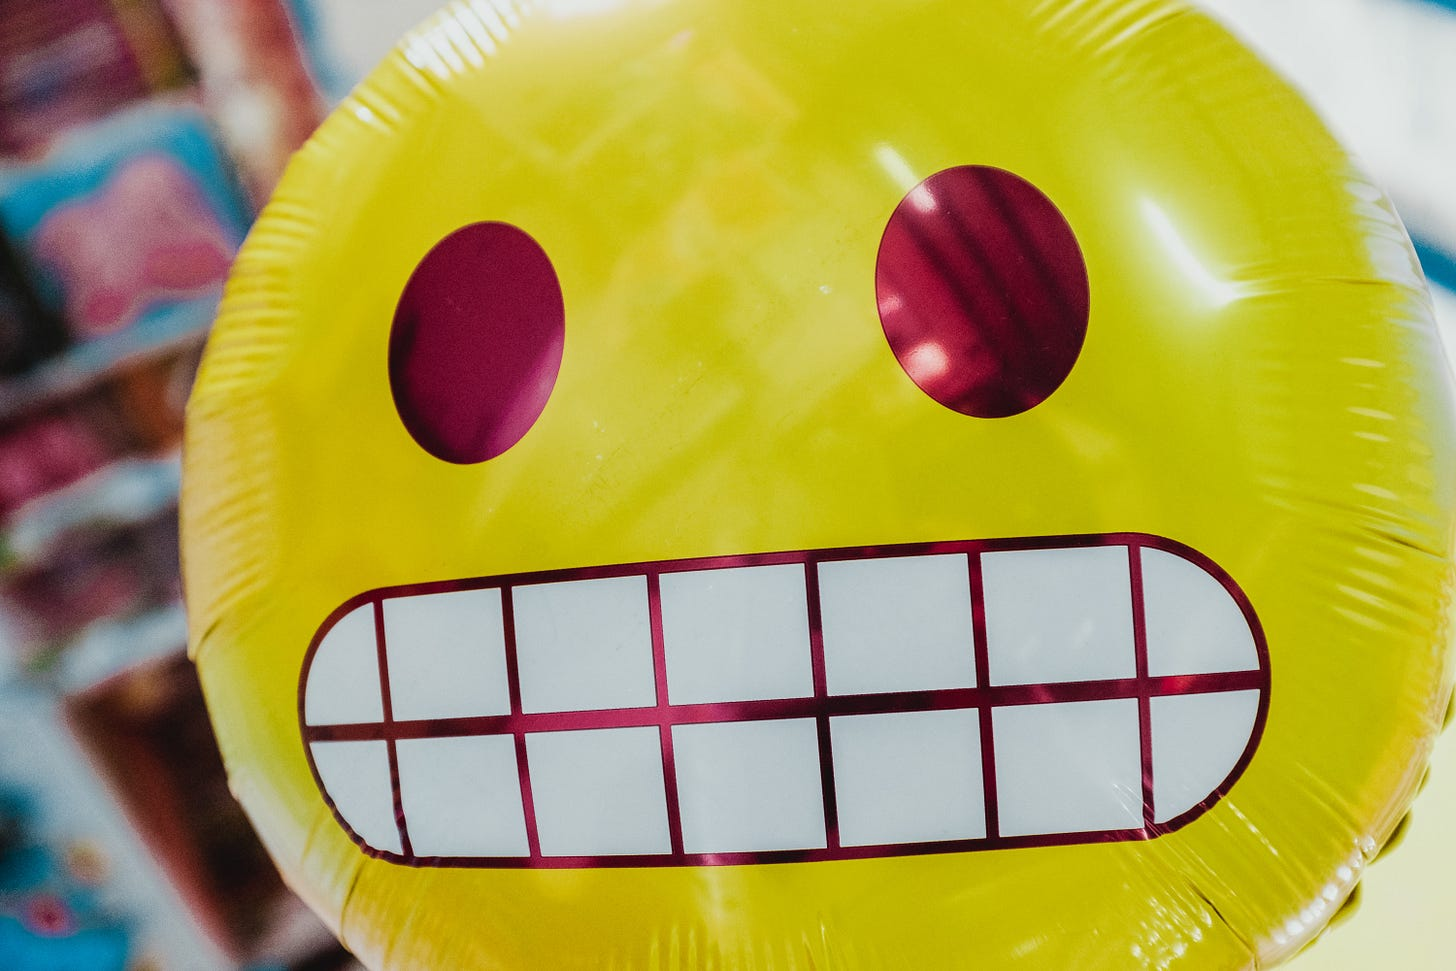 Photo of a ballon in the shape of a grimacing emoji. (Bernard Hermant / Unplash)